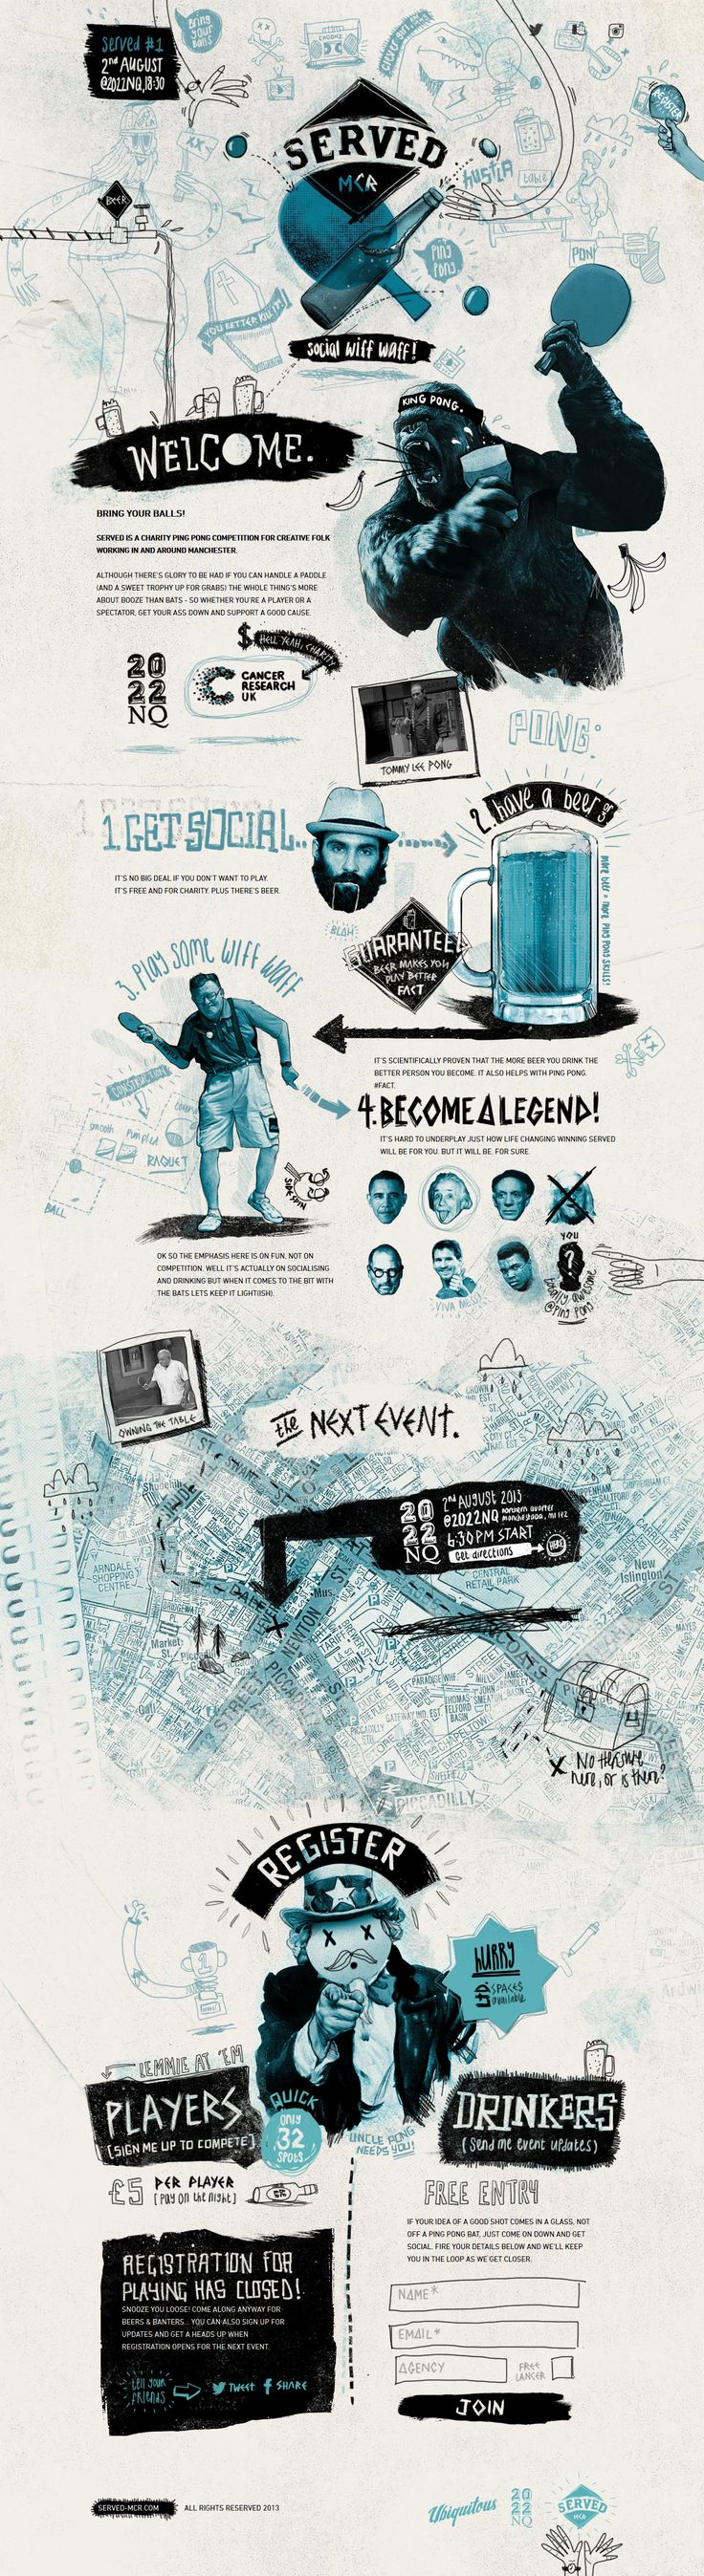 #infographic #web #webdesign